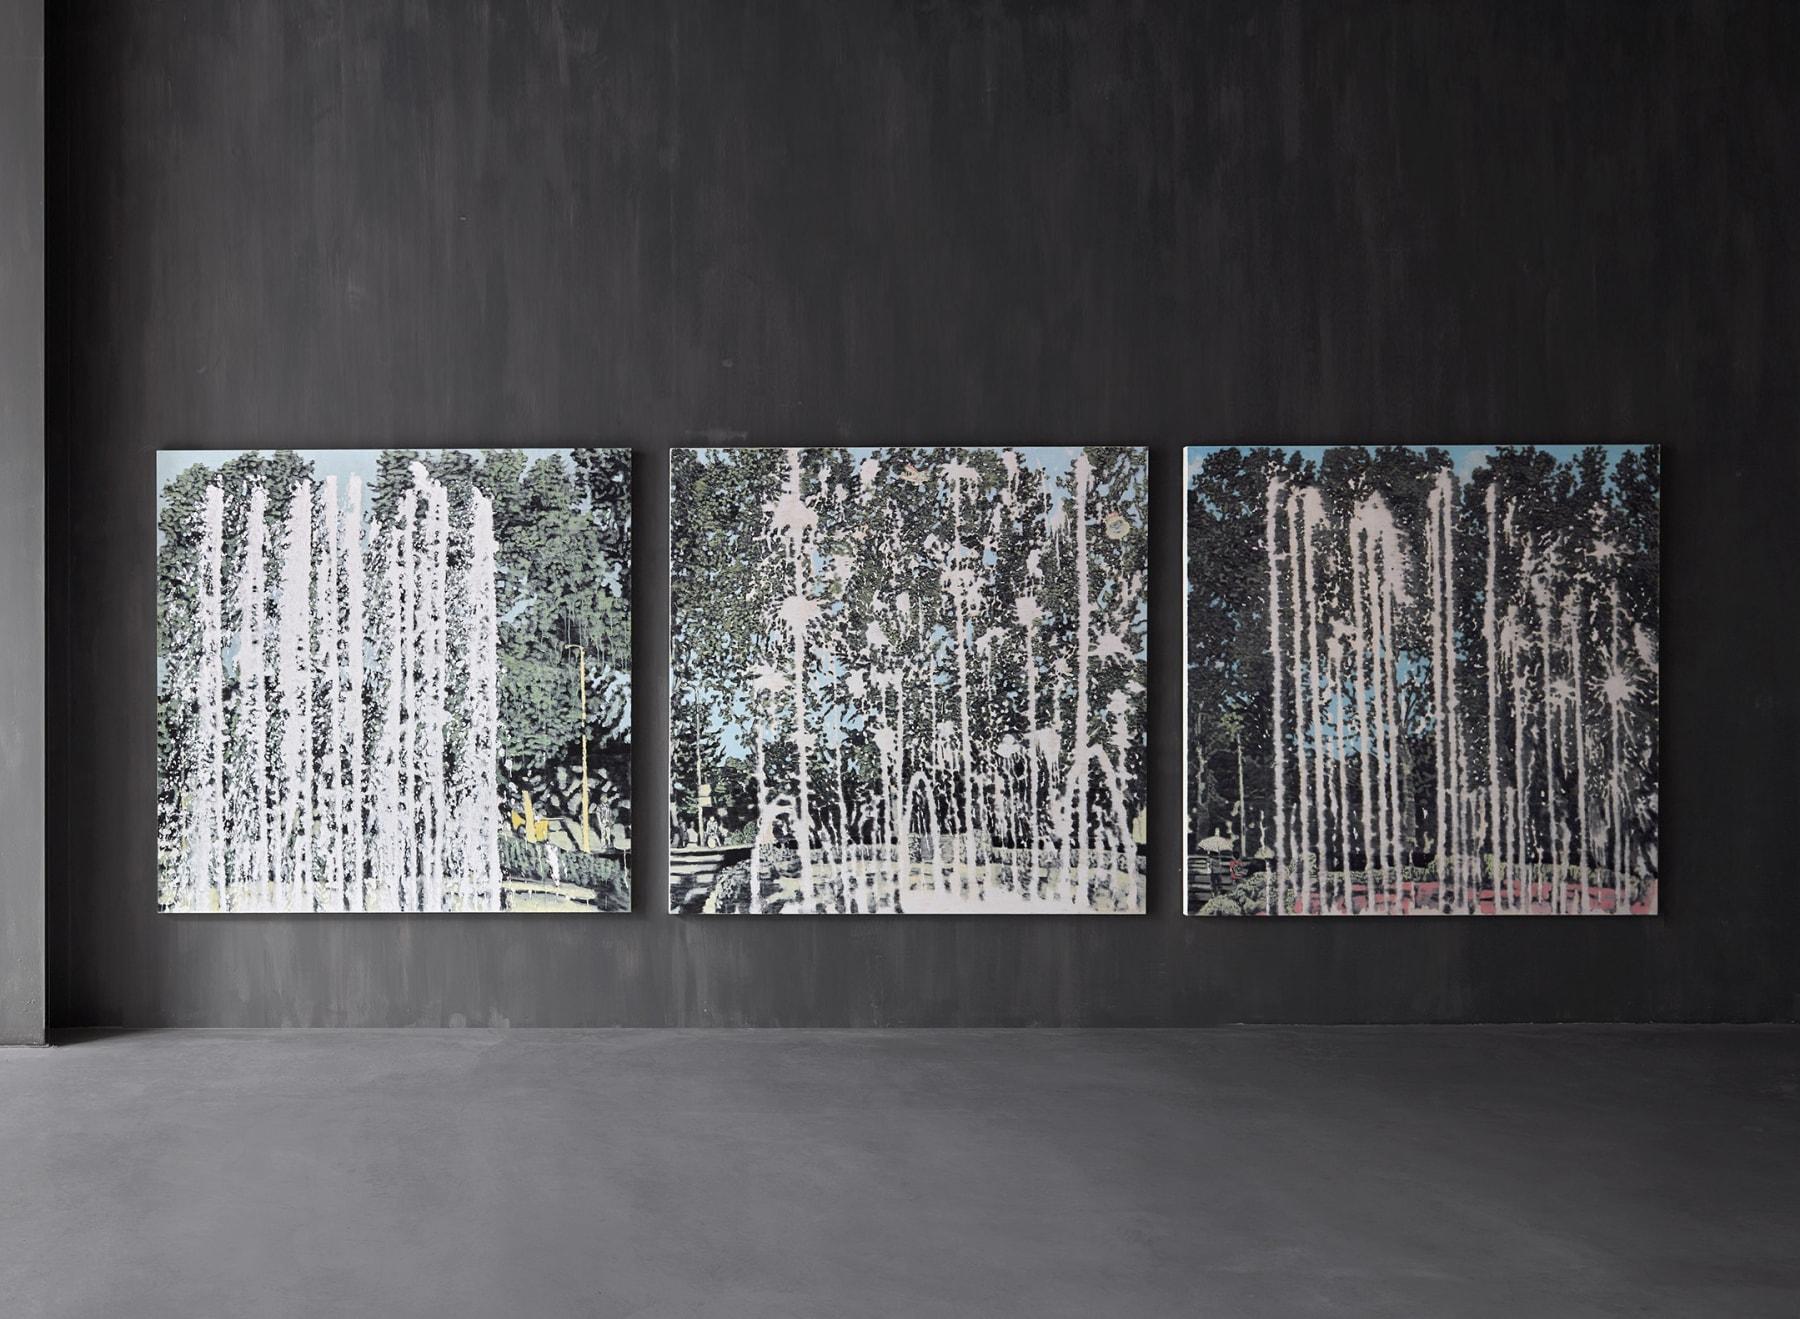 Yoo Guen-Taek, Fountain Series, 2009